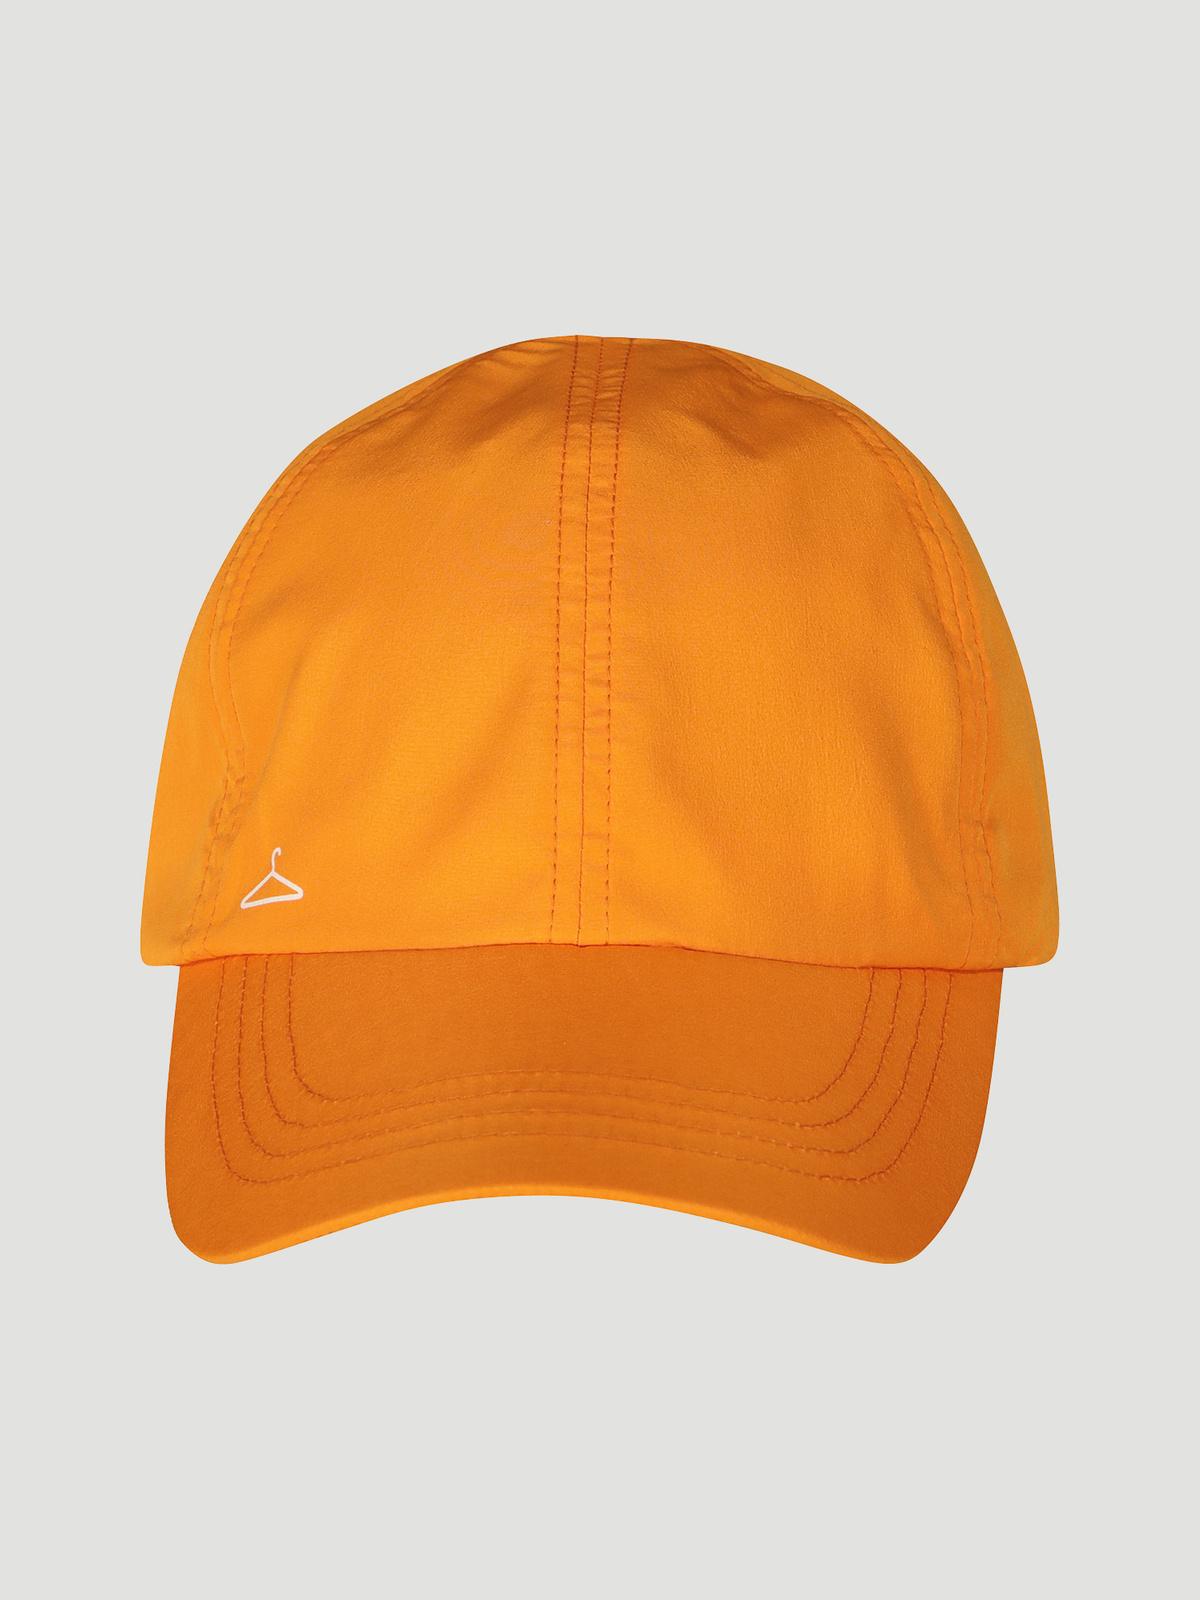 Hanger Caps Orange 1